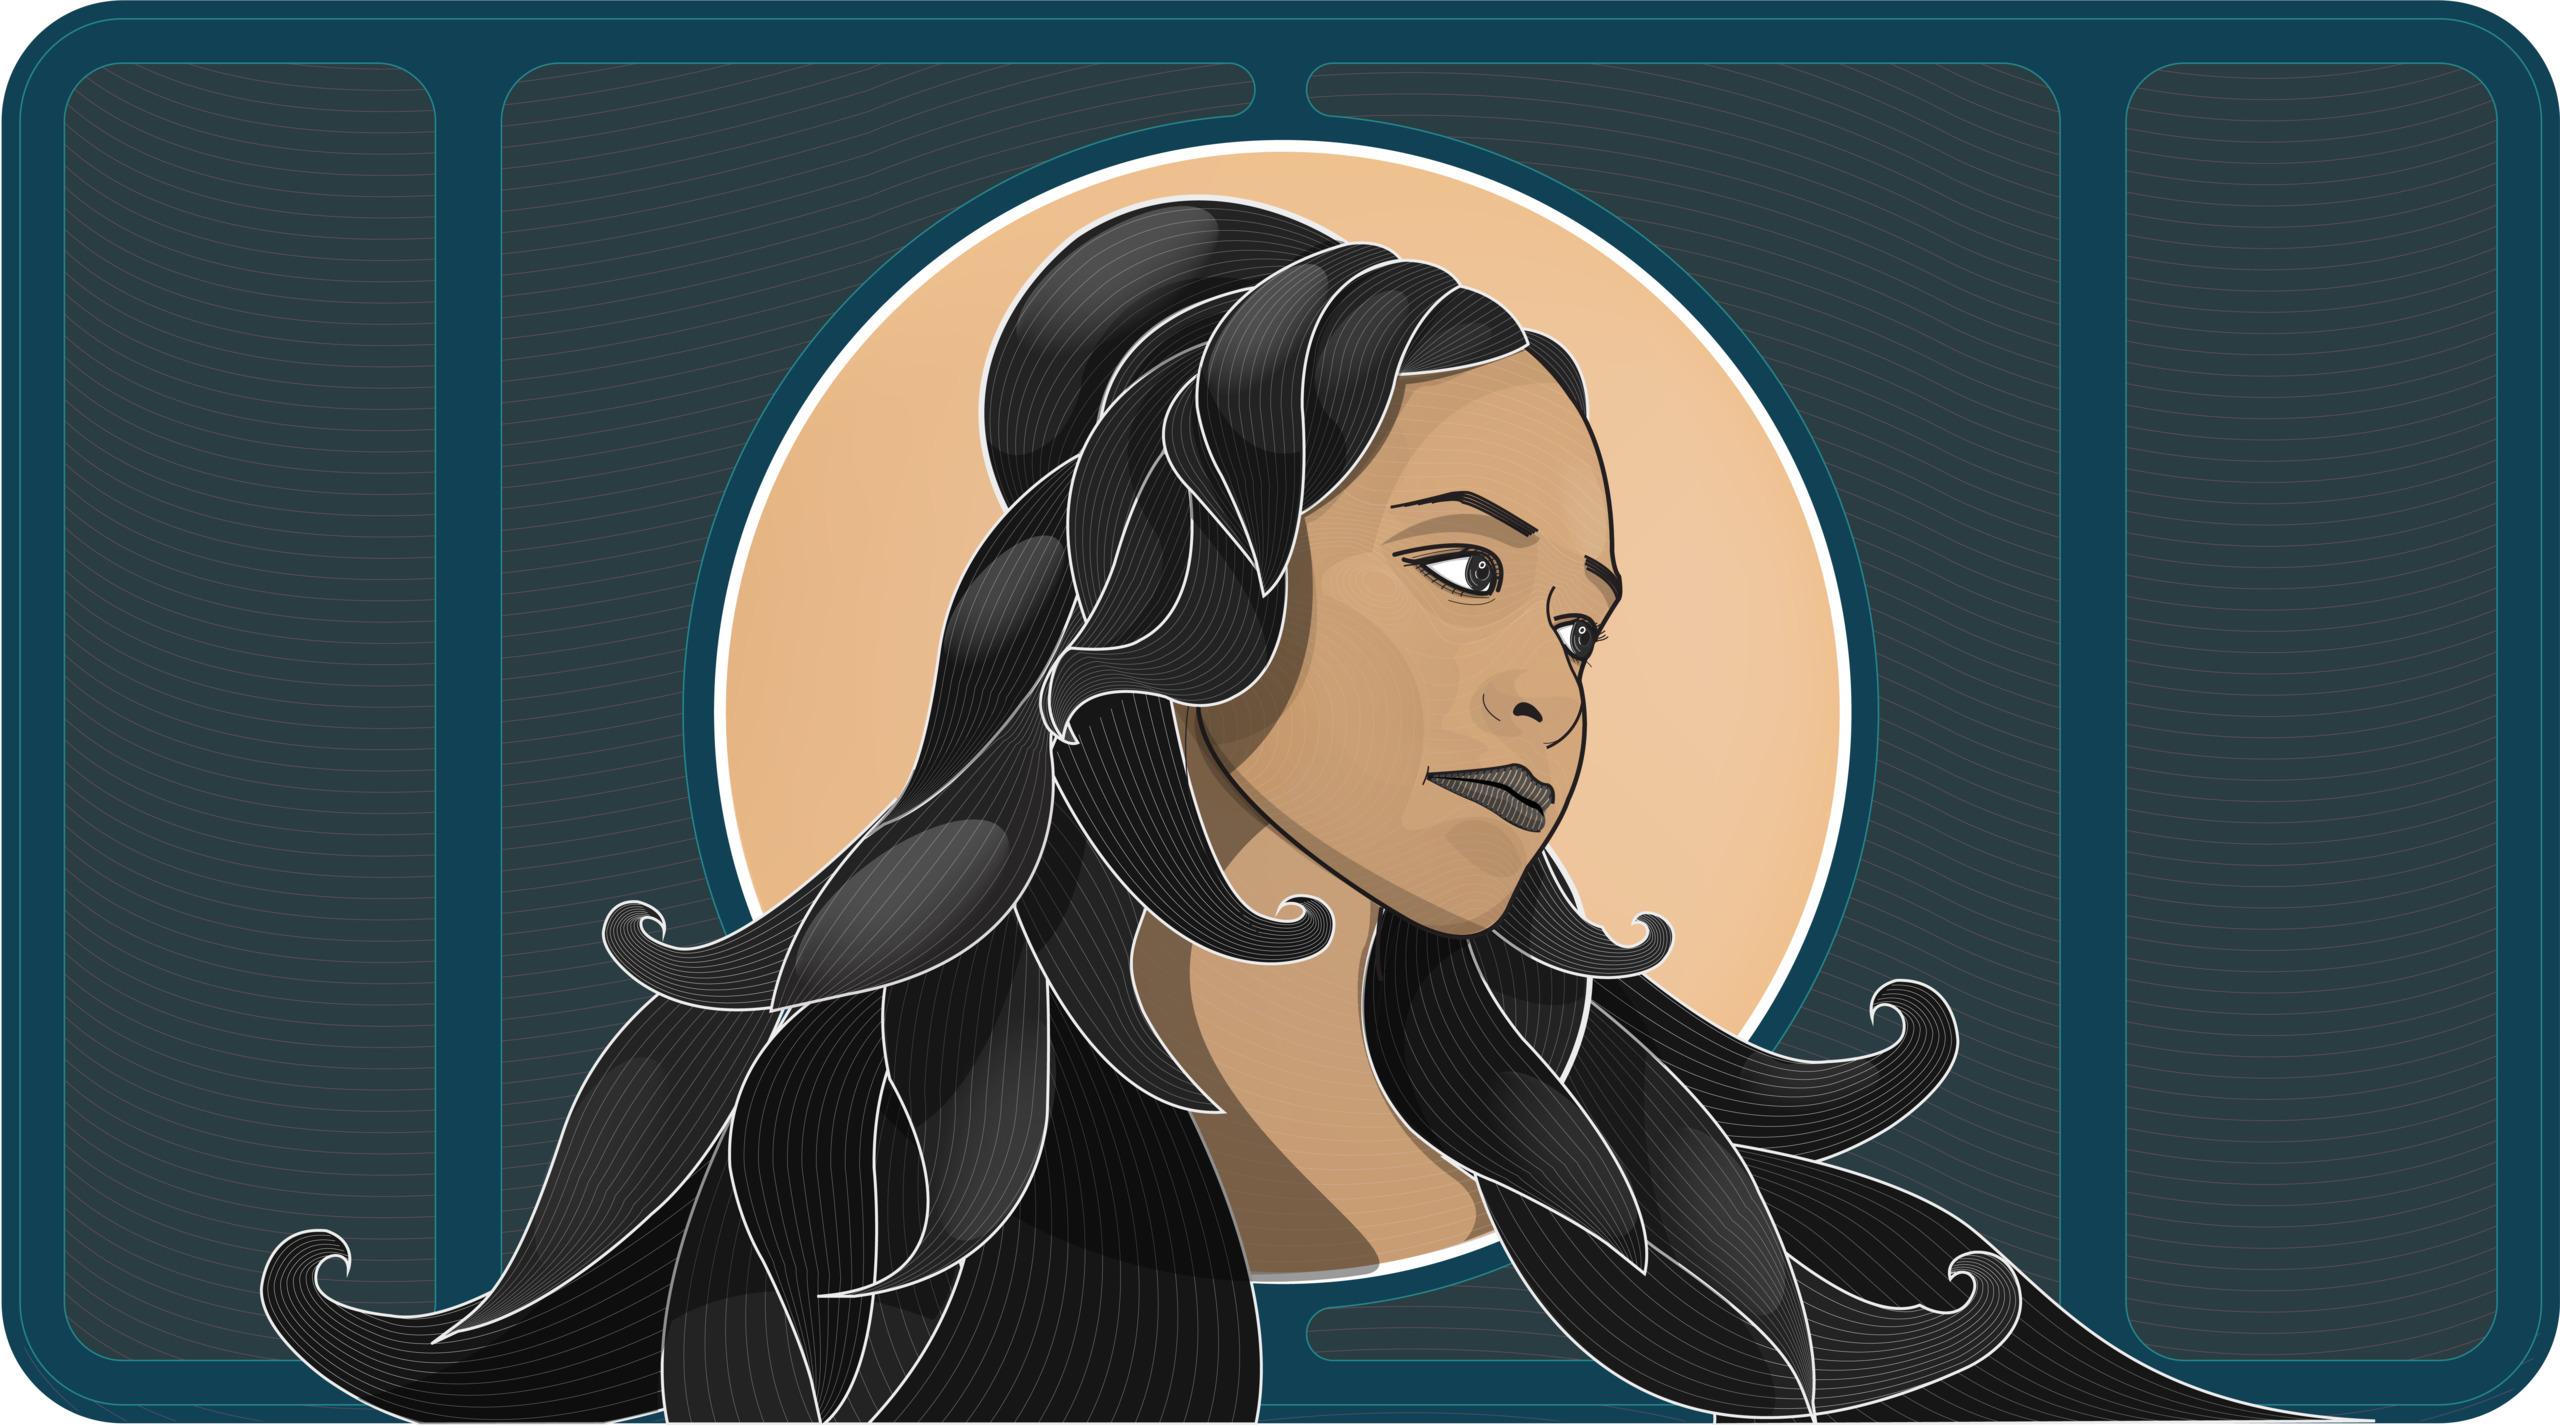 illustration, woman, vectorillustration - pedrobarrera | ello